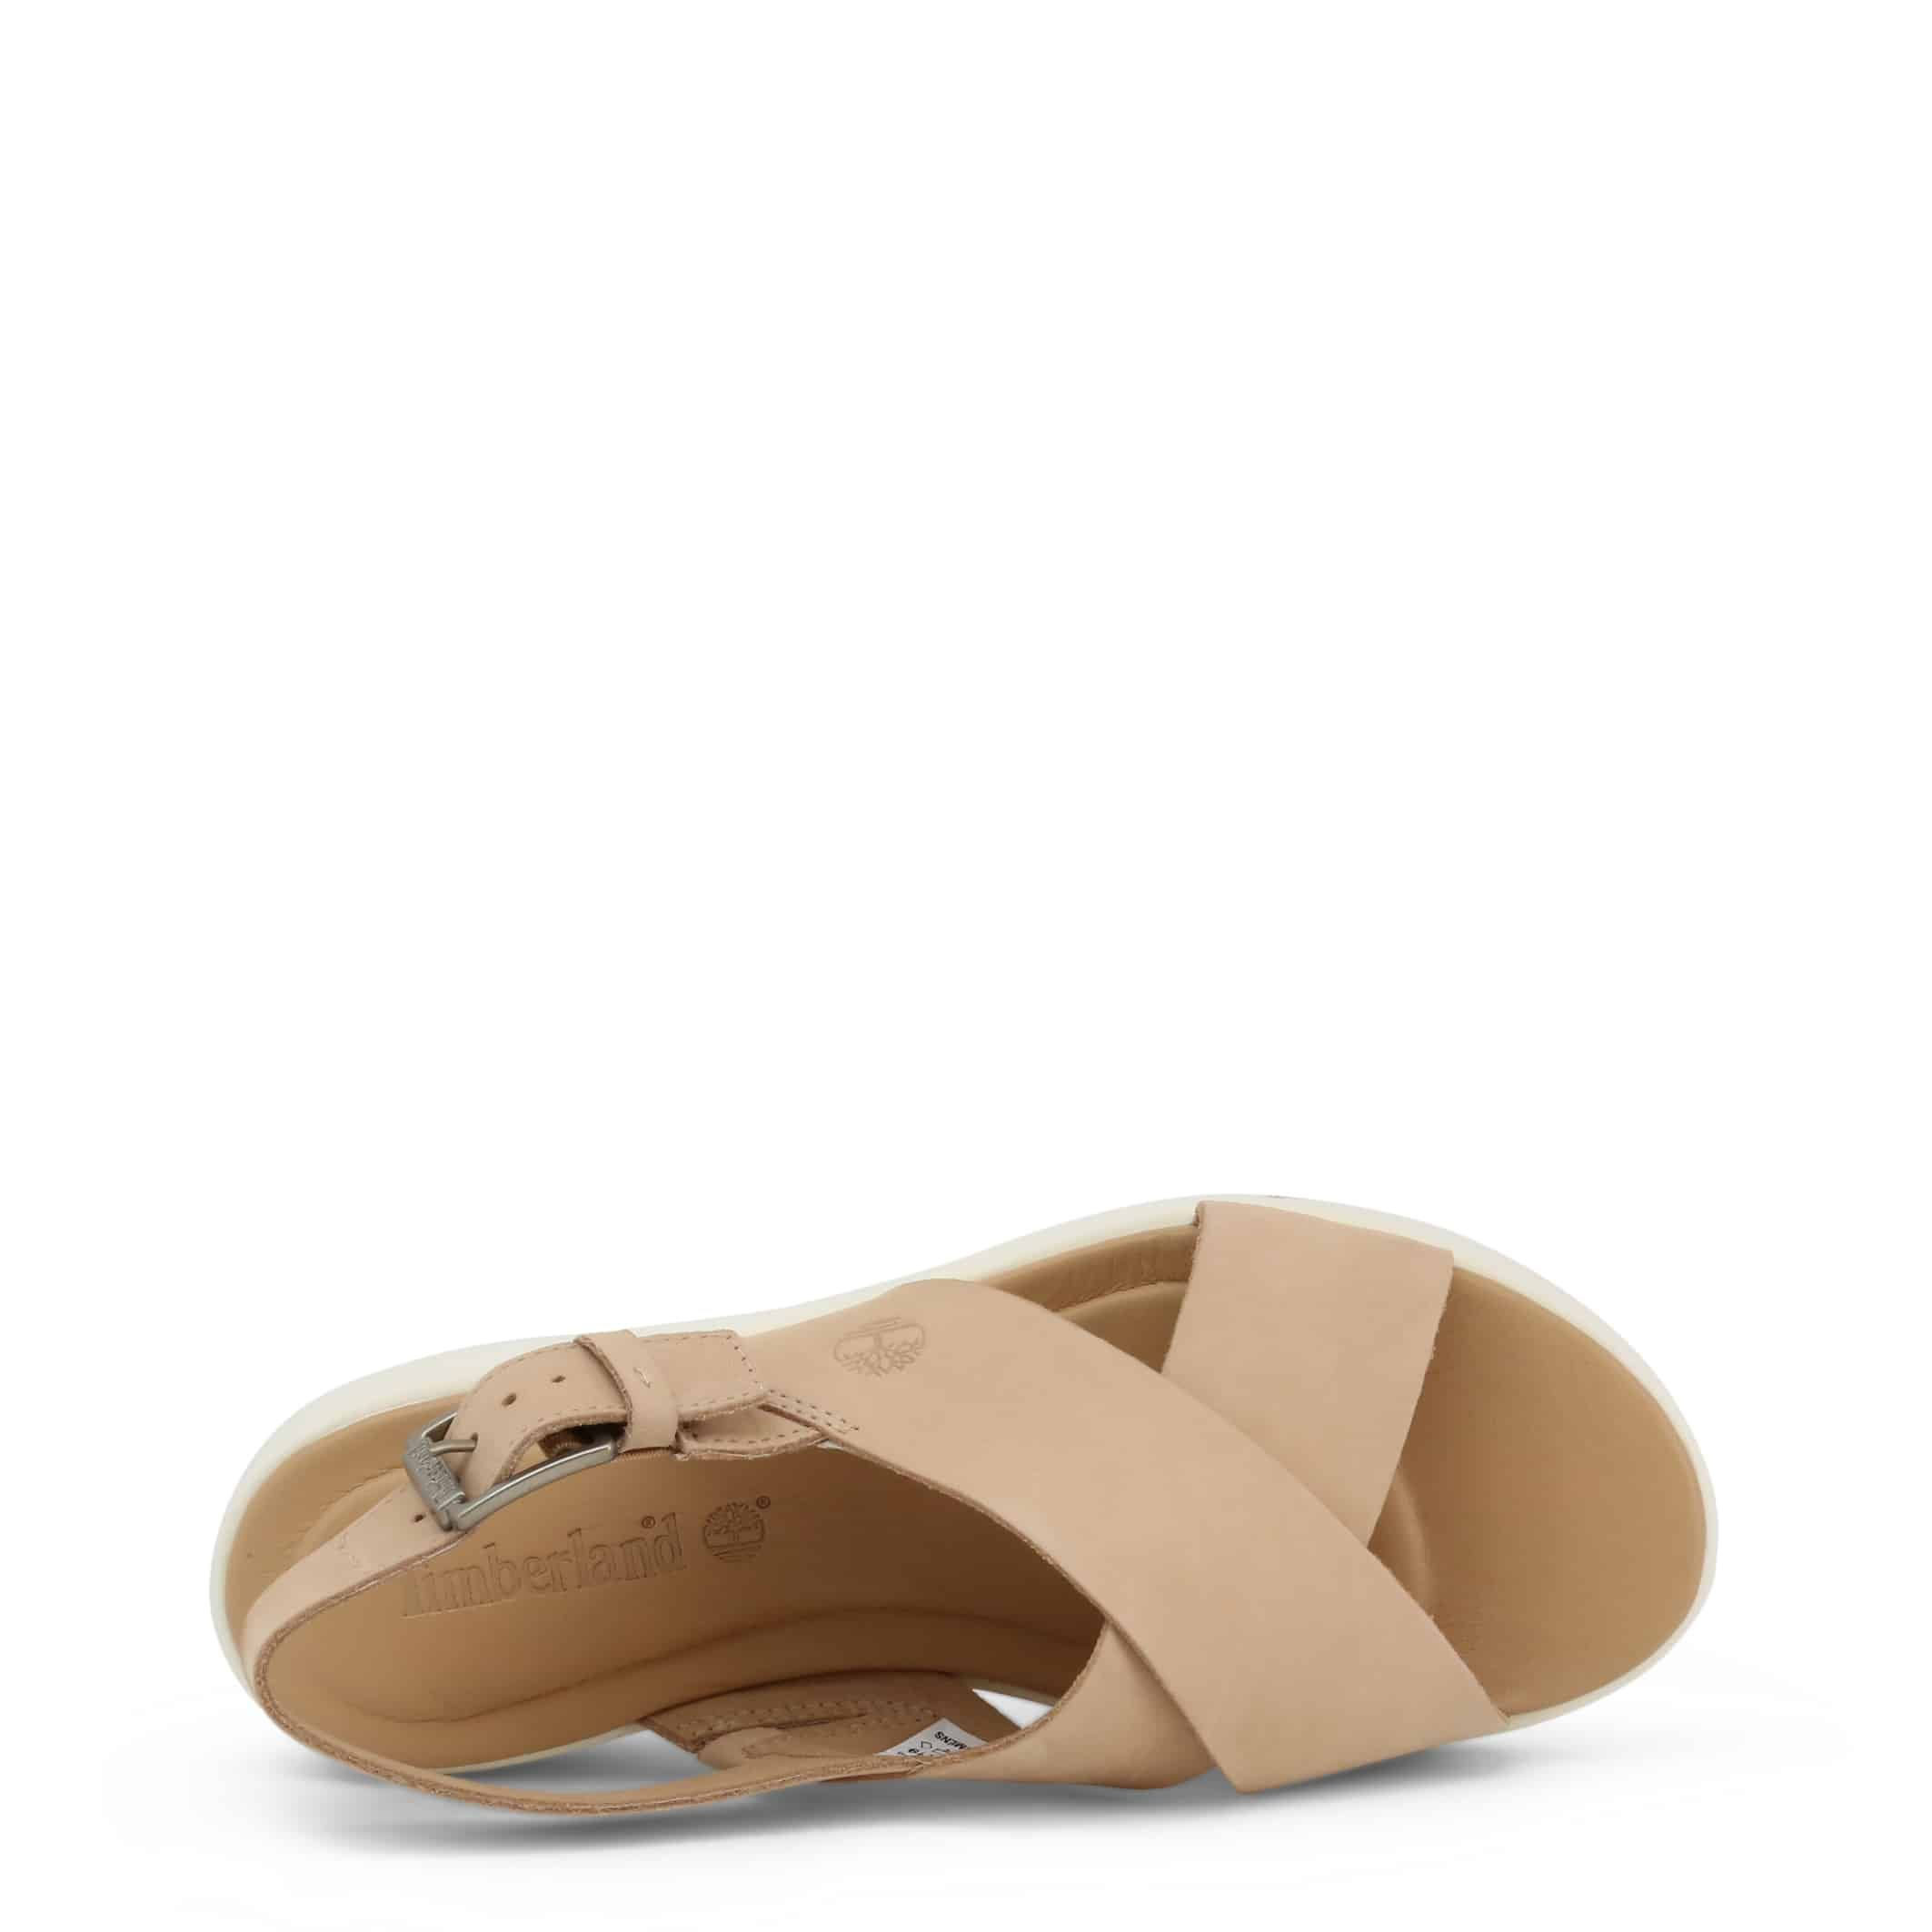 Chaussures Timberland – LosAngeles